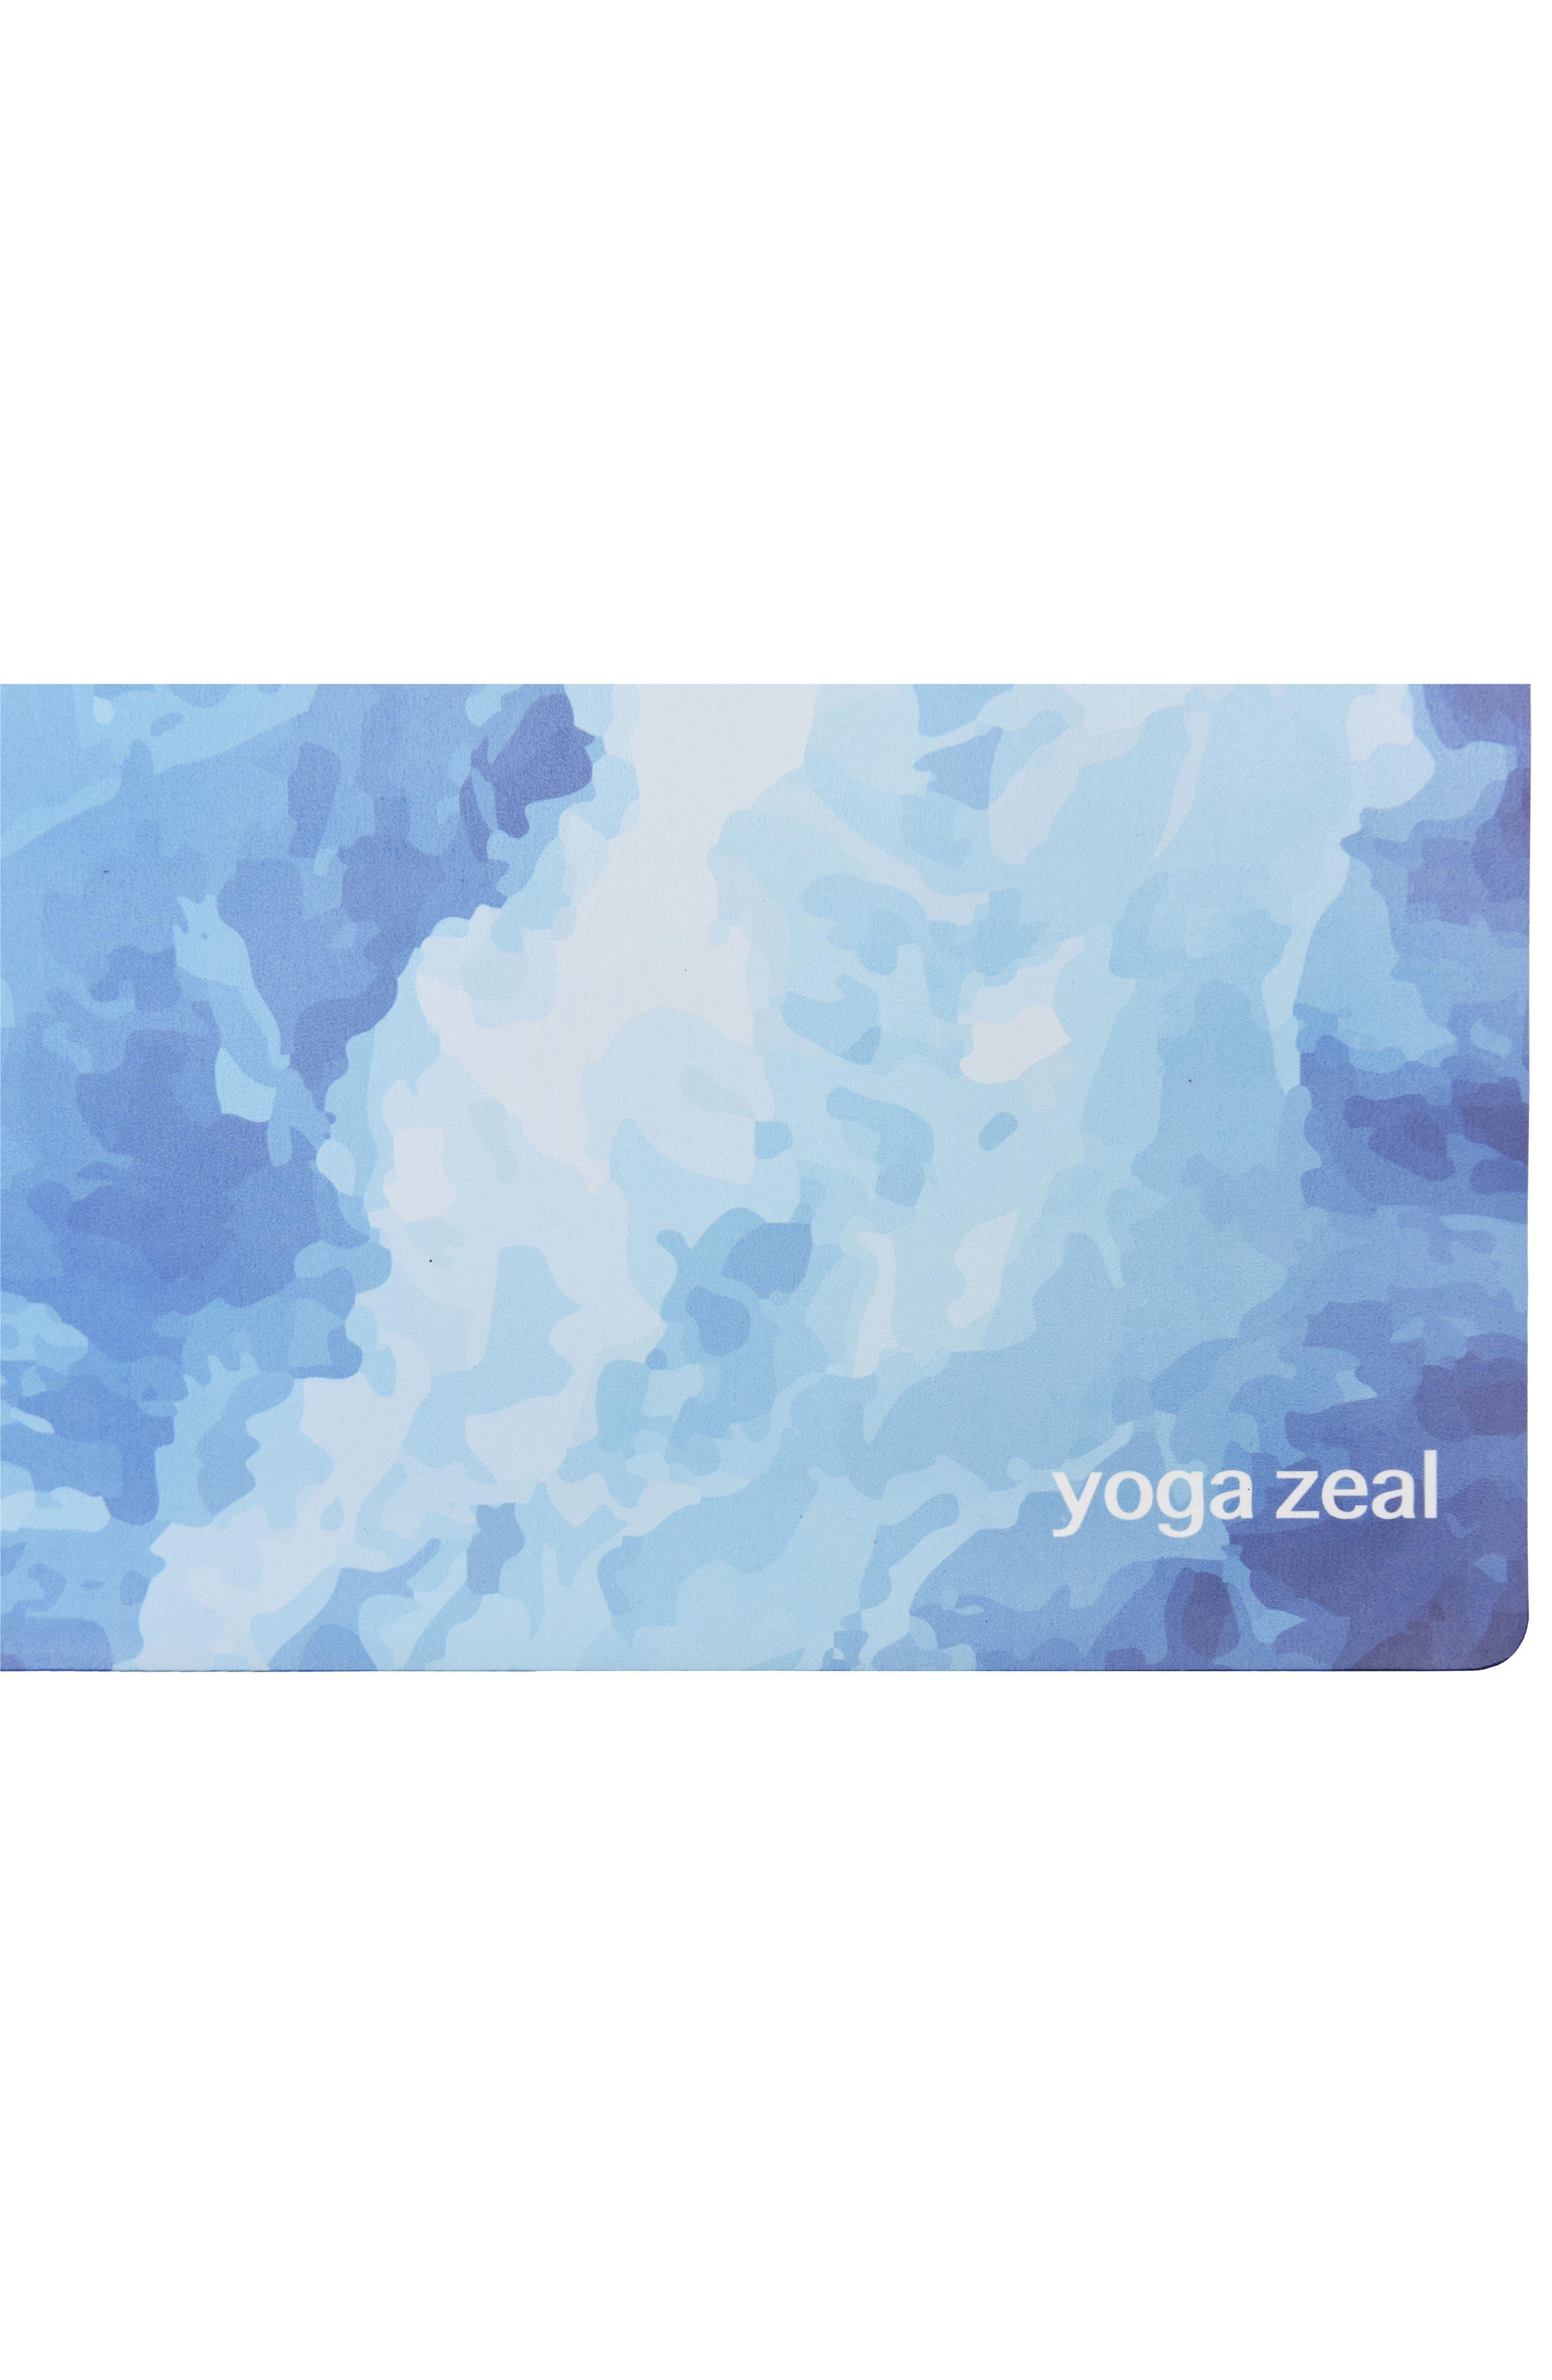 Ocean Print Yoga Mat,                             Alternate thumbnail 3, color,                             Blue